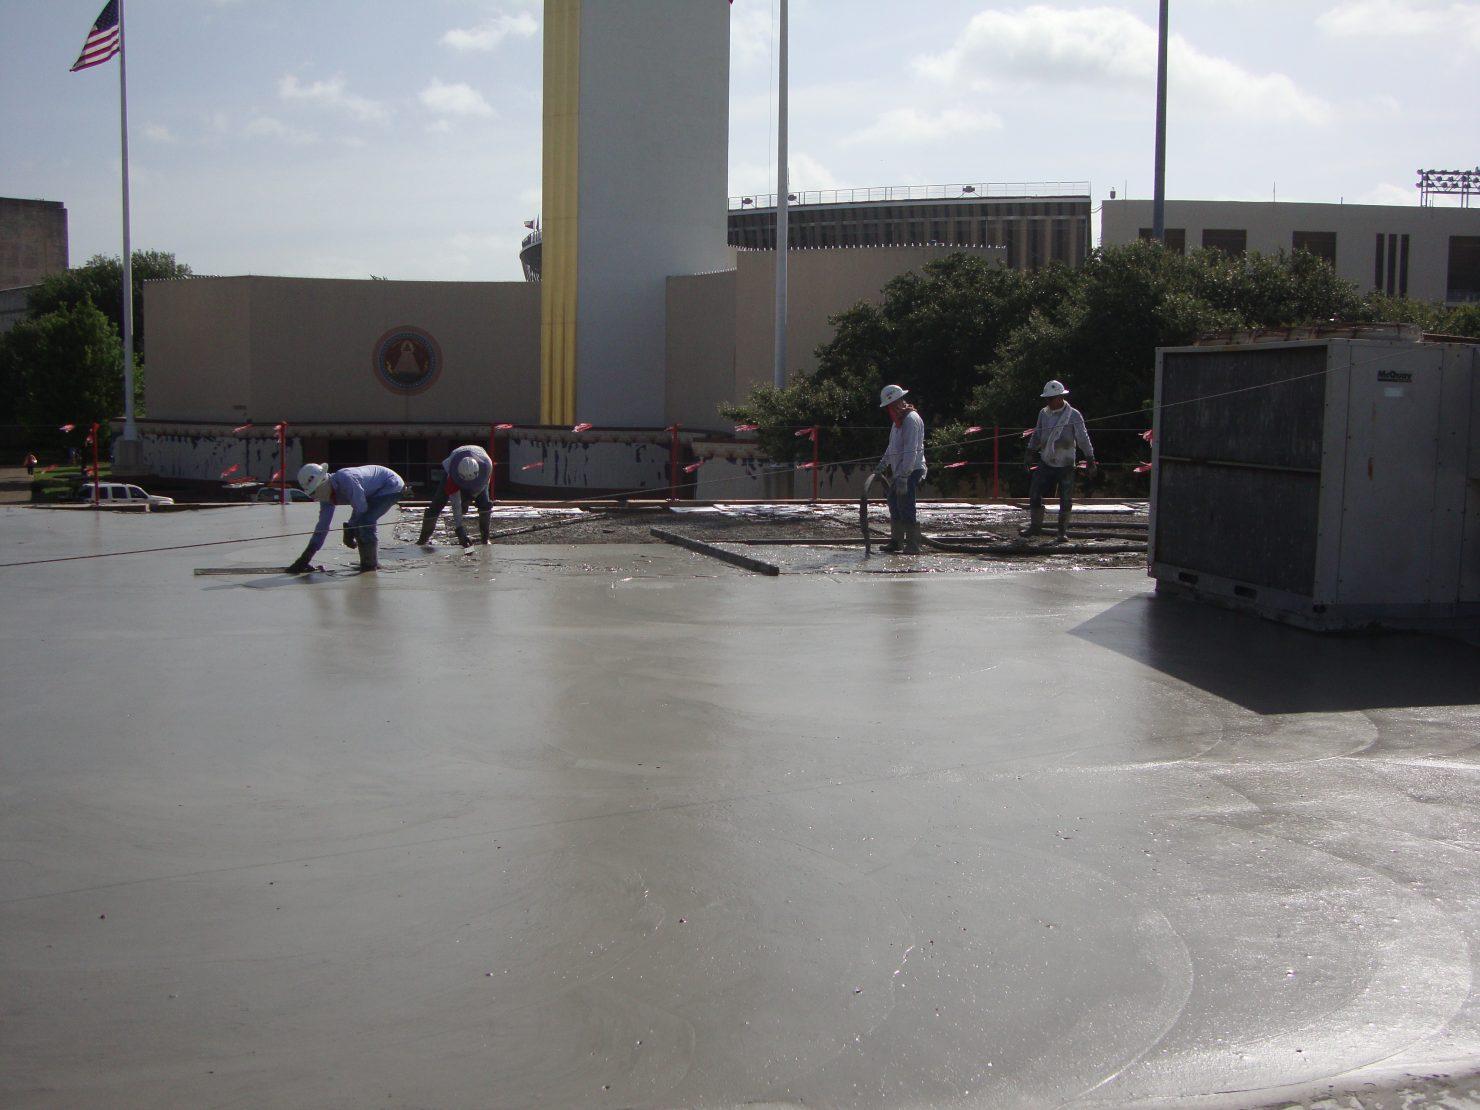 Dallas Fair Park Grand Place Re-Roofing